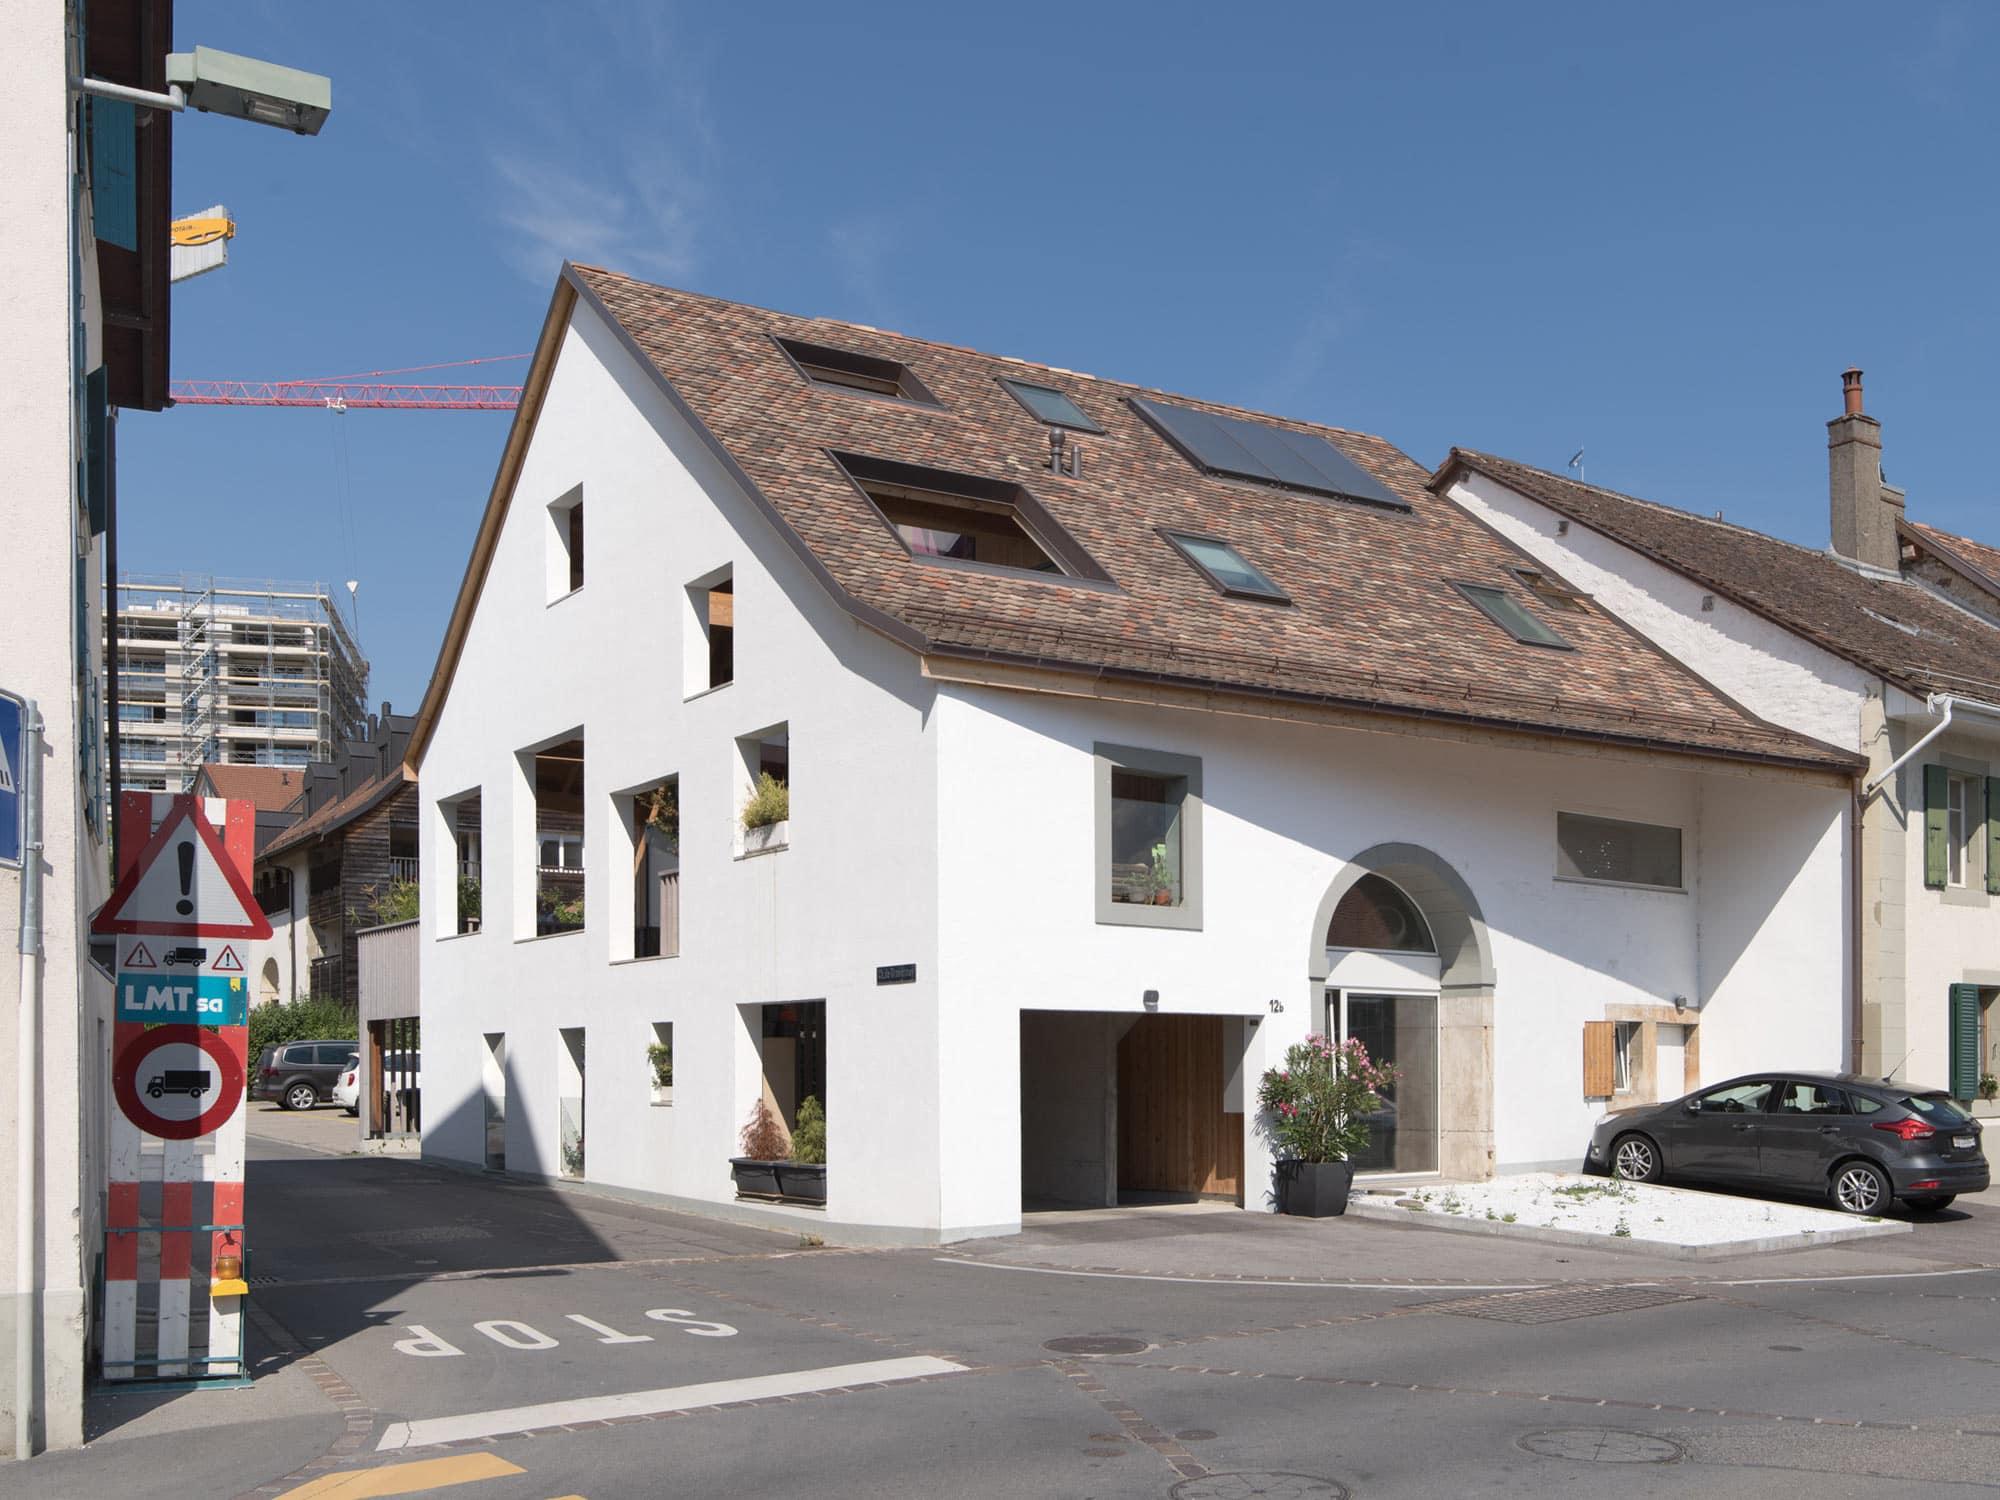 architecture villageoise